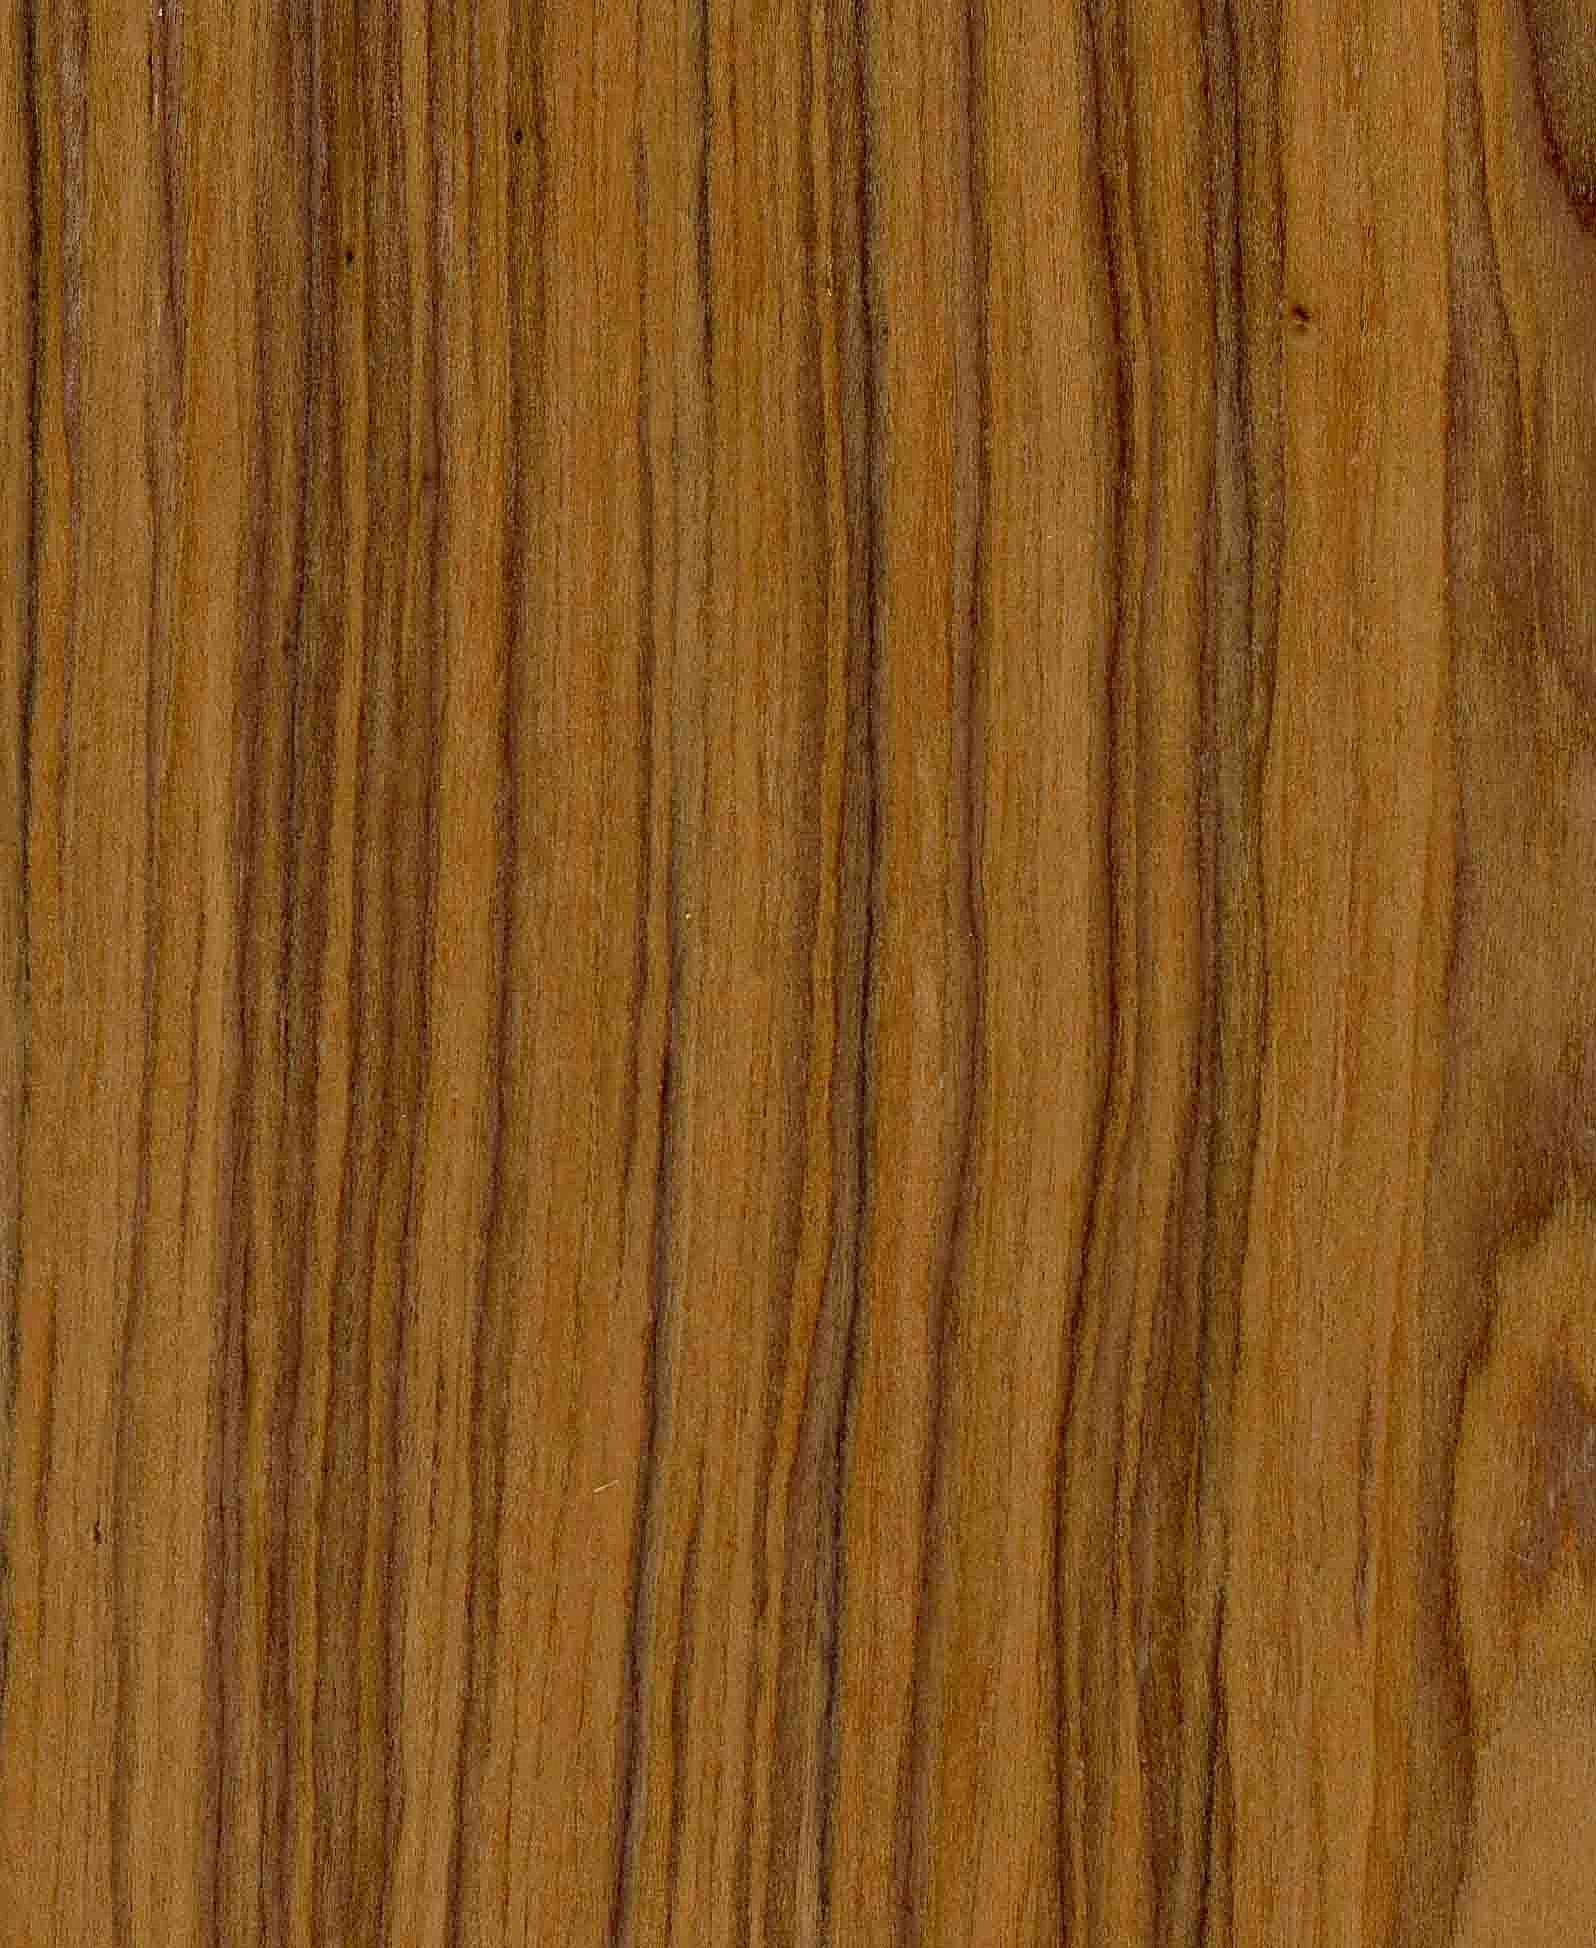 SAGEWOOD TRADING - Suppliers of Fancy Plywood and Veneer ...